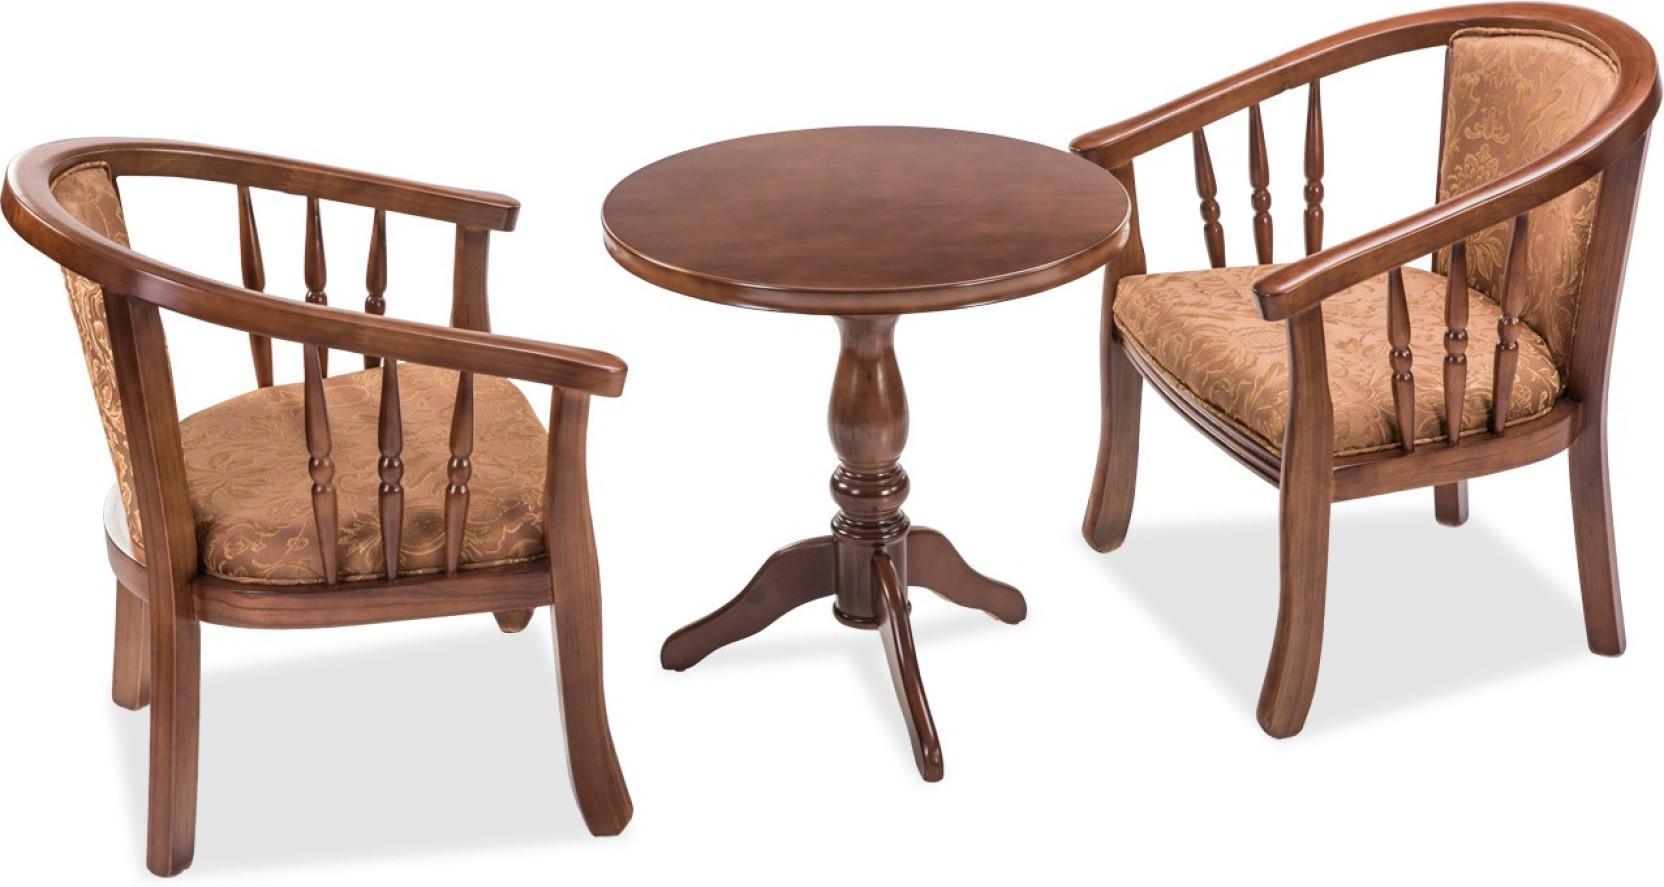 Durian Brighton Engineered Wood 2 Seater Dining Set Price